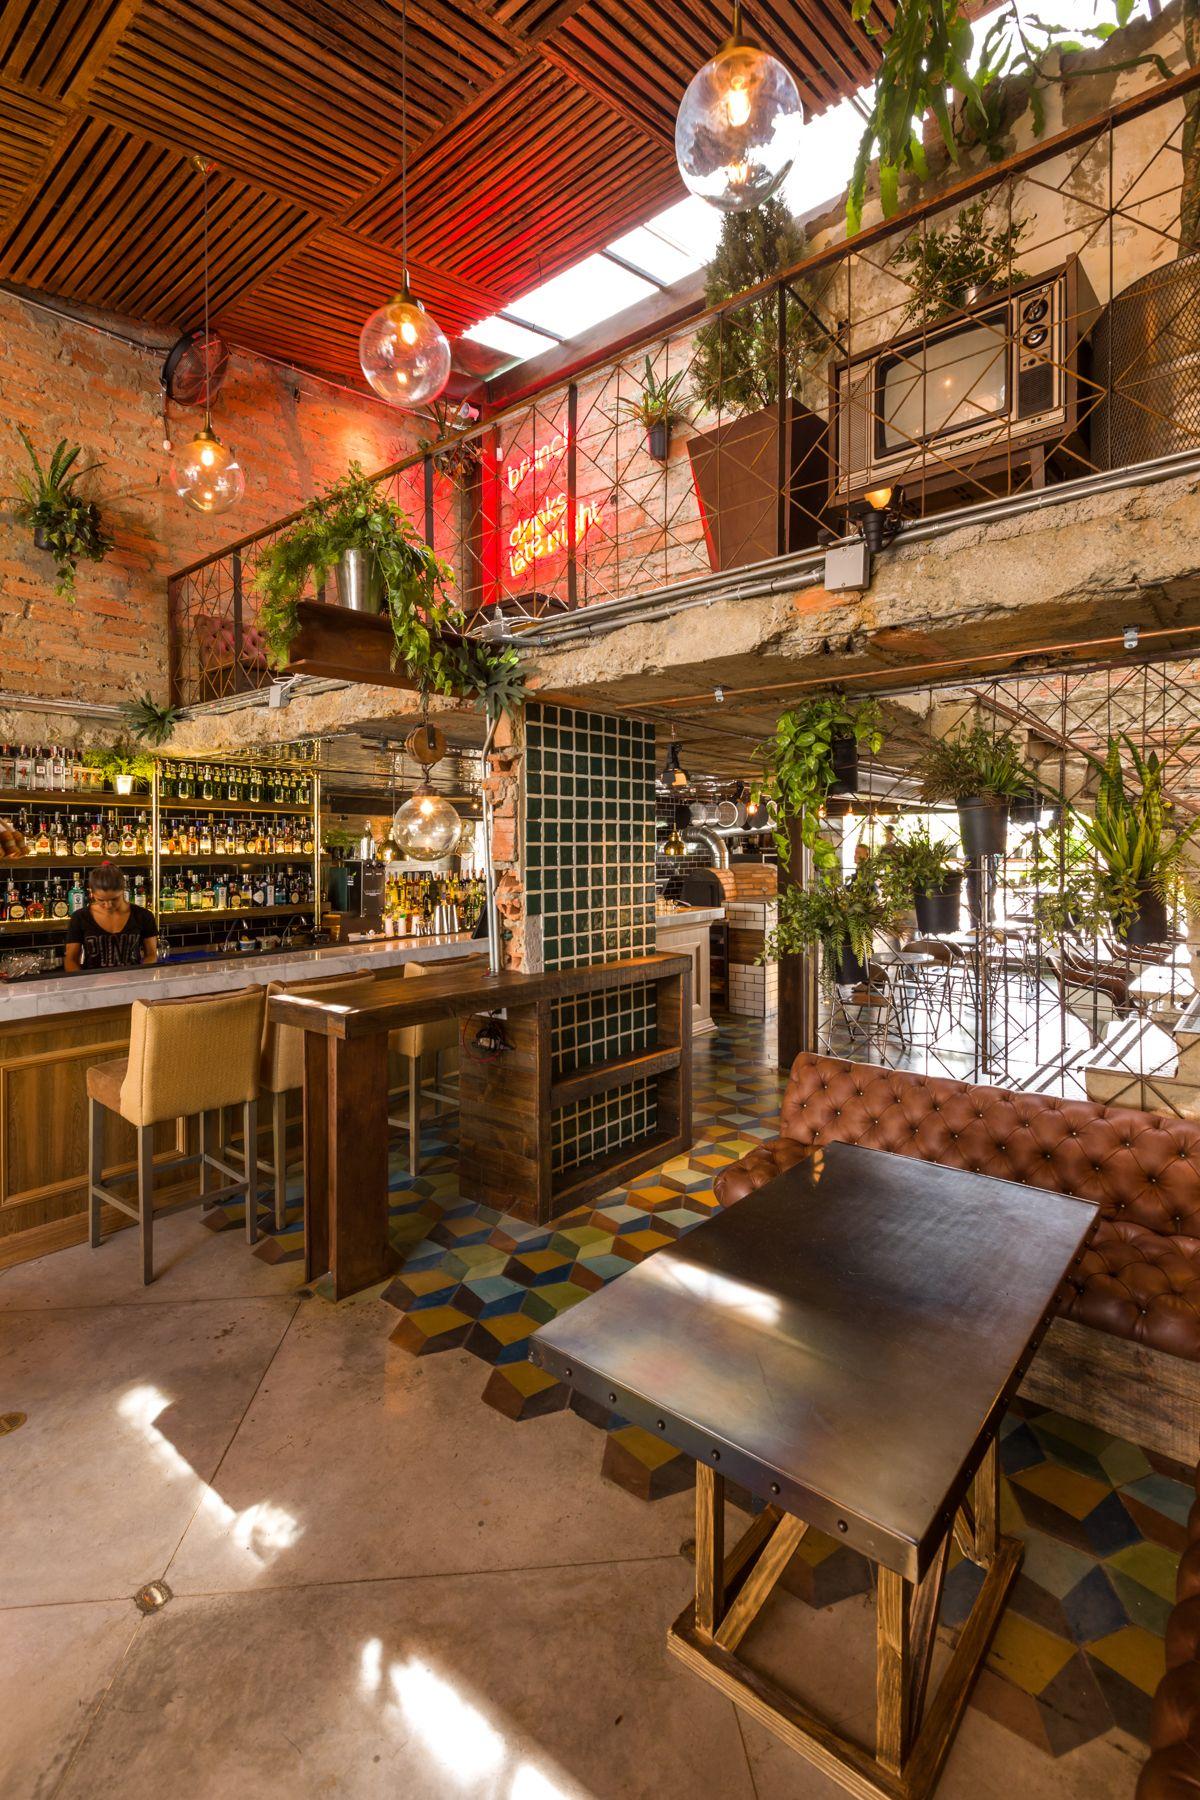 20151006c Juanri Ideas Restaurante Pinterest